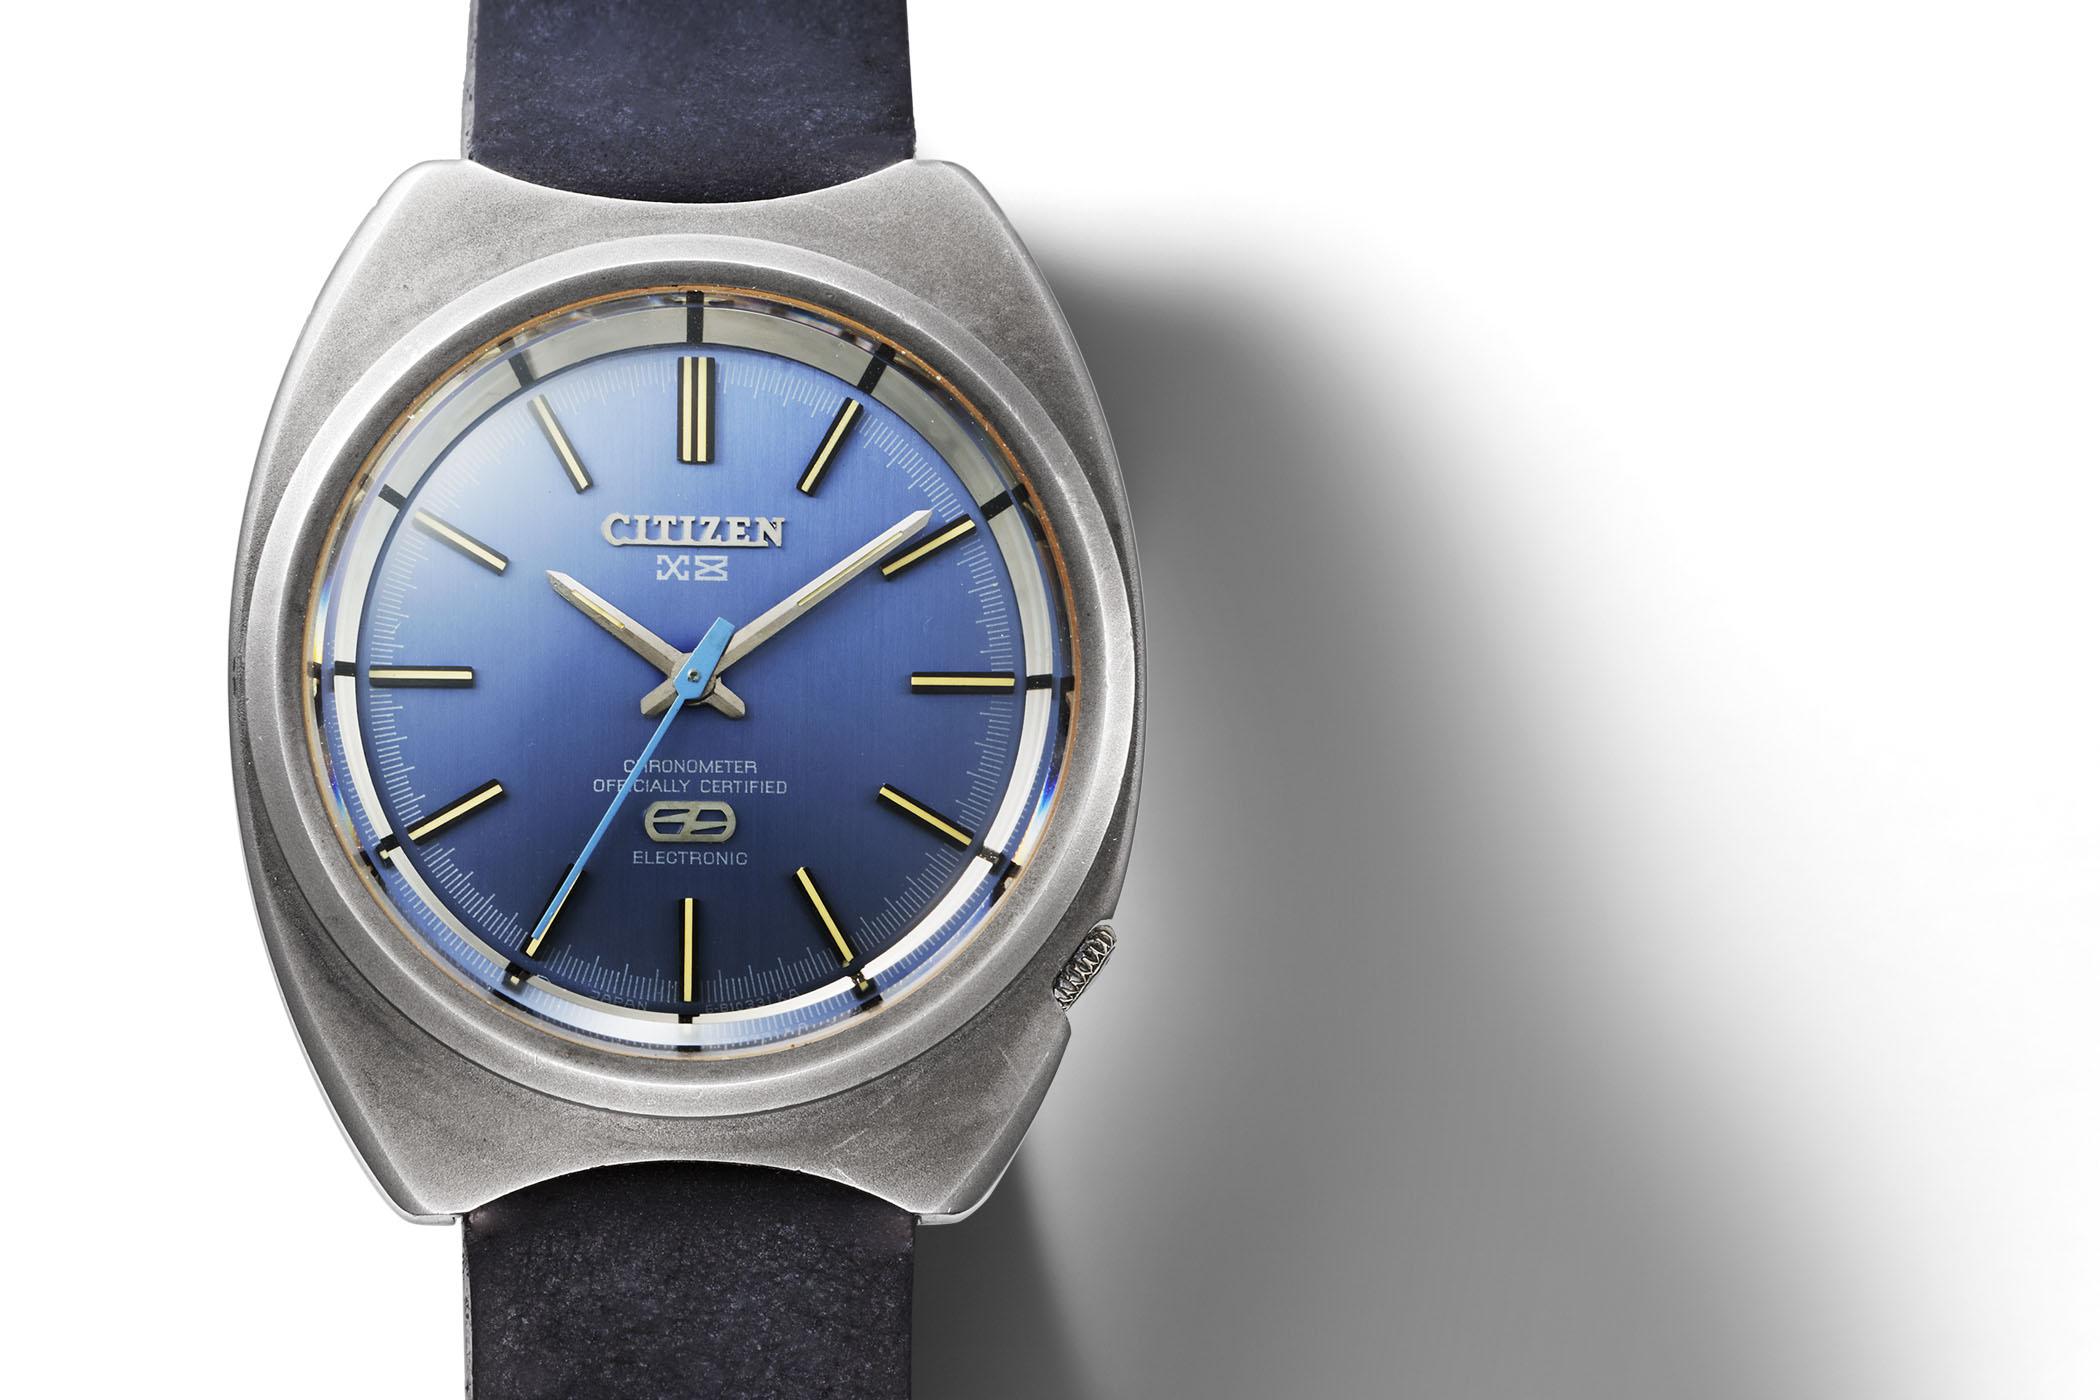 1970 Citizen X-8 Chronometer - first titanium watch